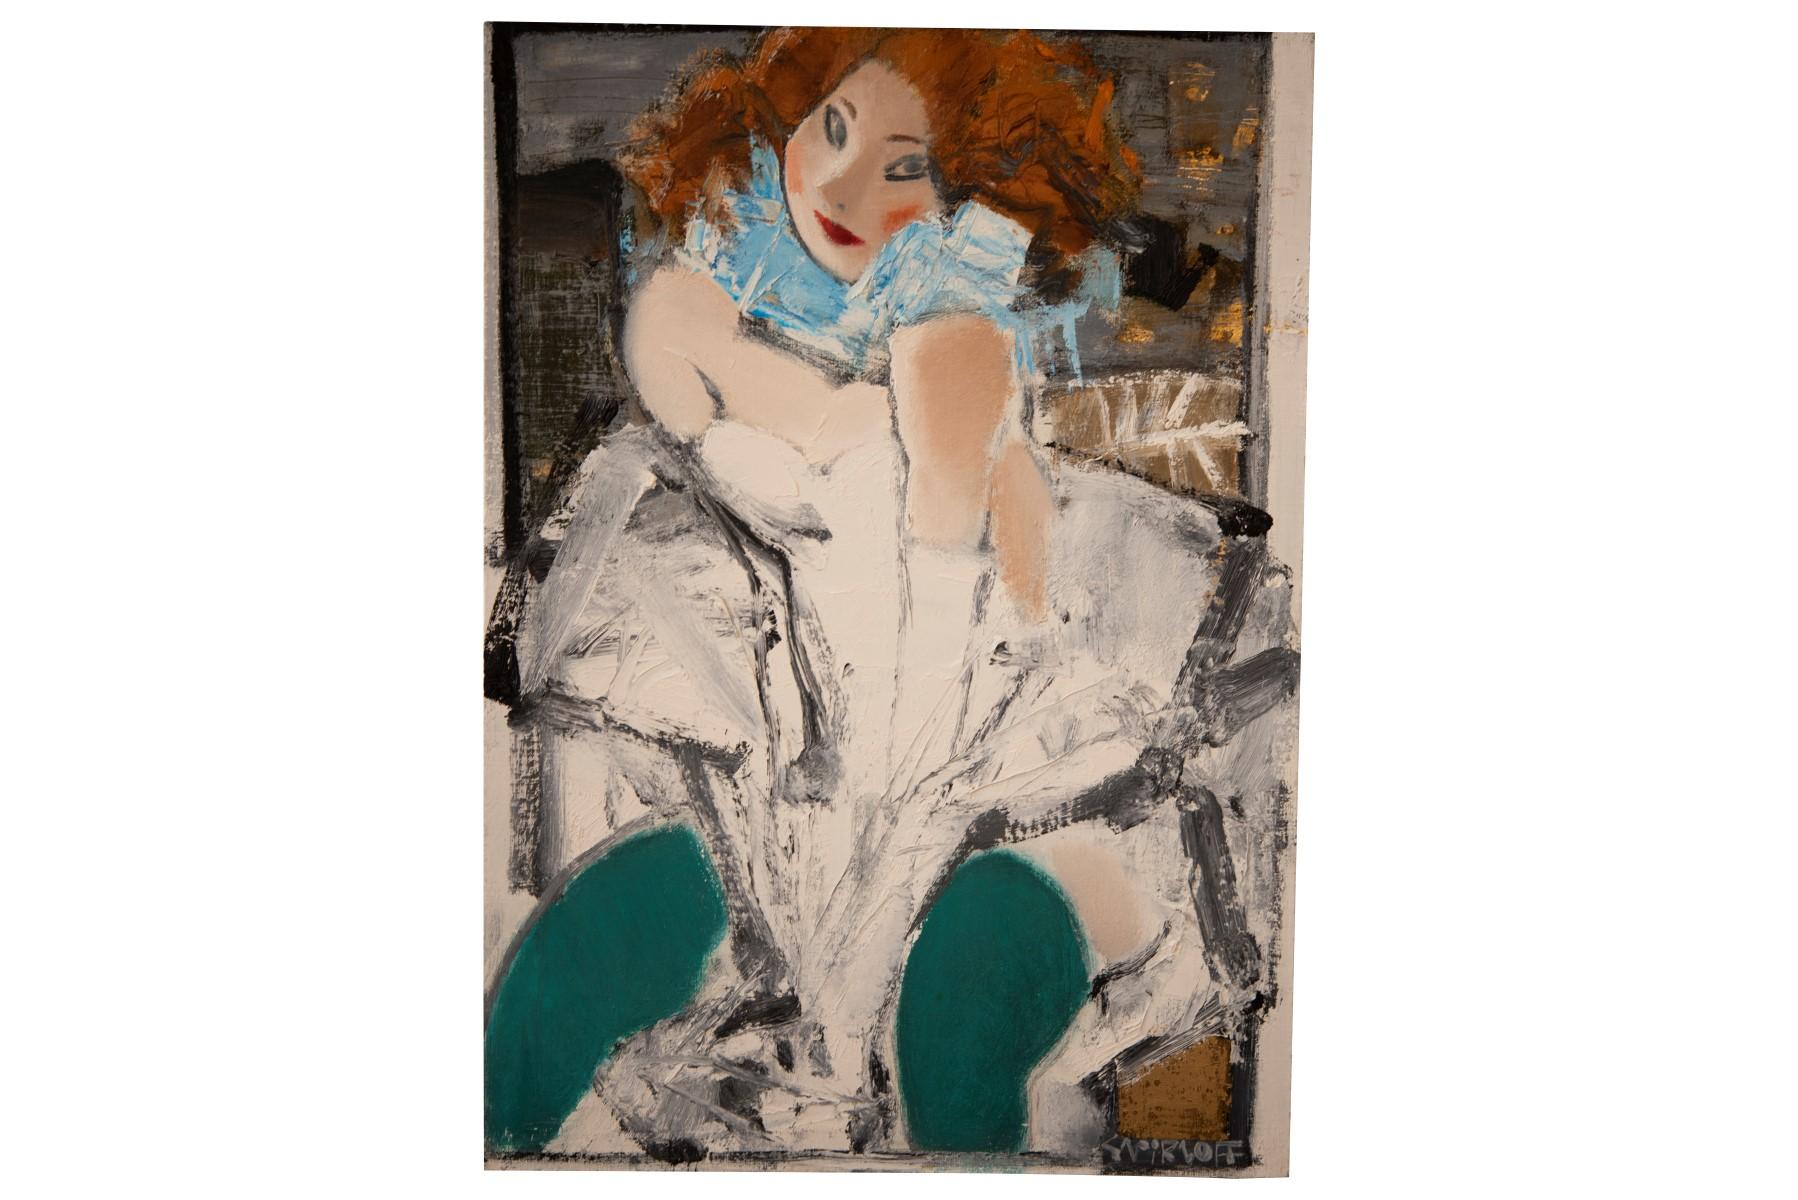 #177 Andrai Smirnoff (1960), Green Socks | Andrai Smirnoff (1960), Green Socks Image